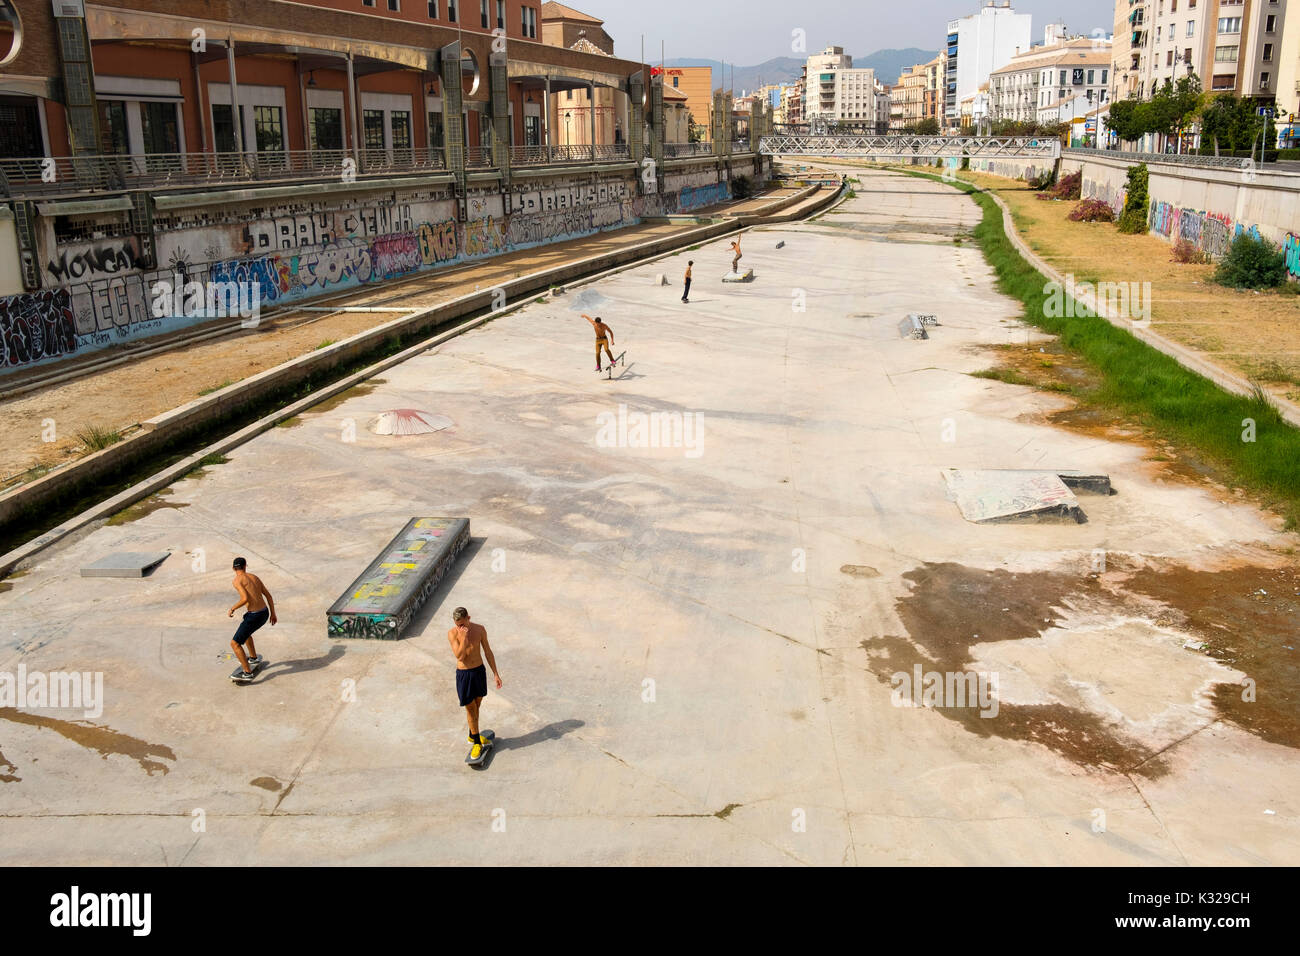 Skateboarders at Guadalmedina river channel, Malaga city, Costa del Sol, Andalusia southern Spain, Europe - Stock Image